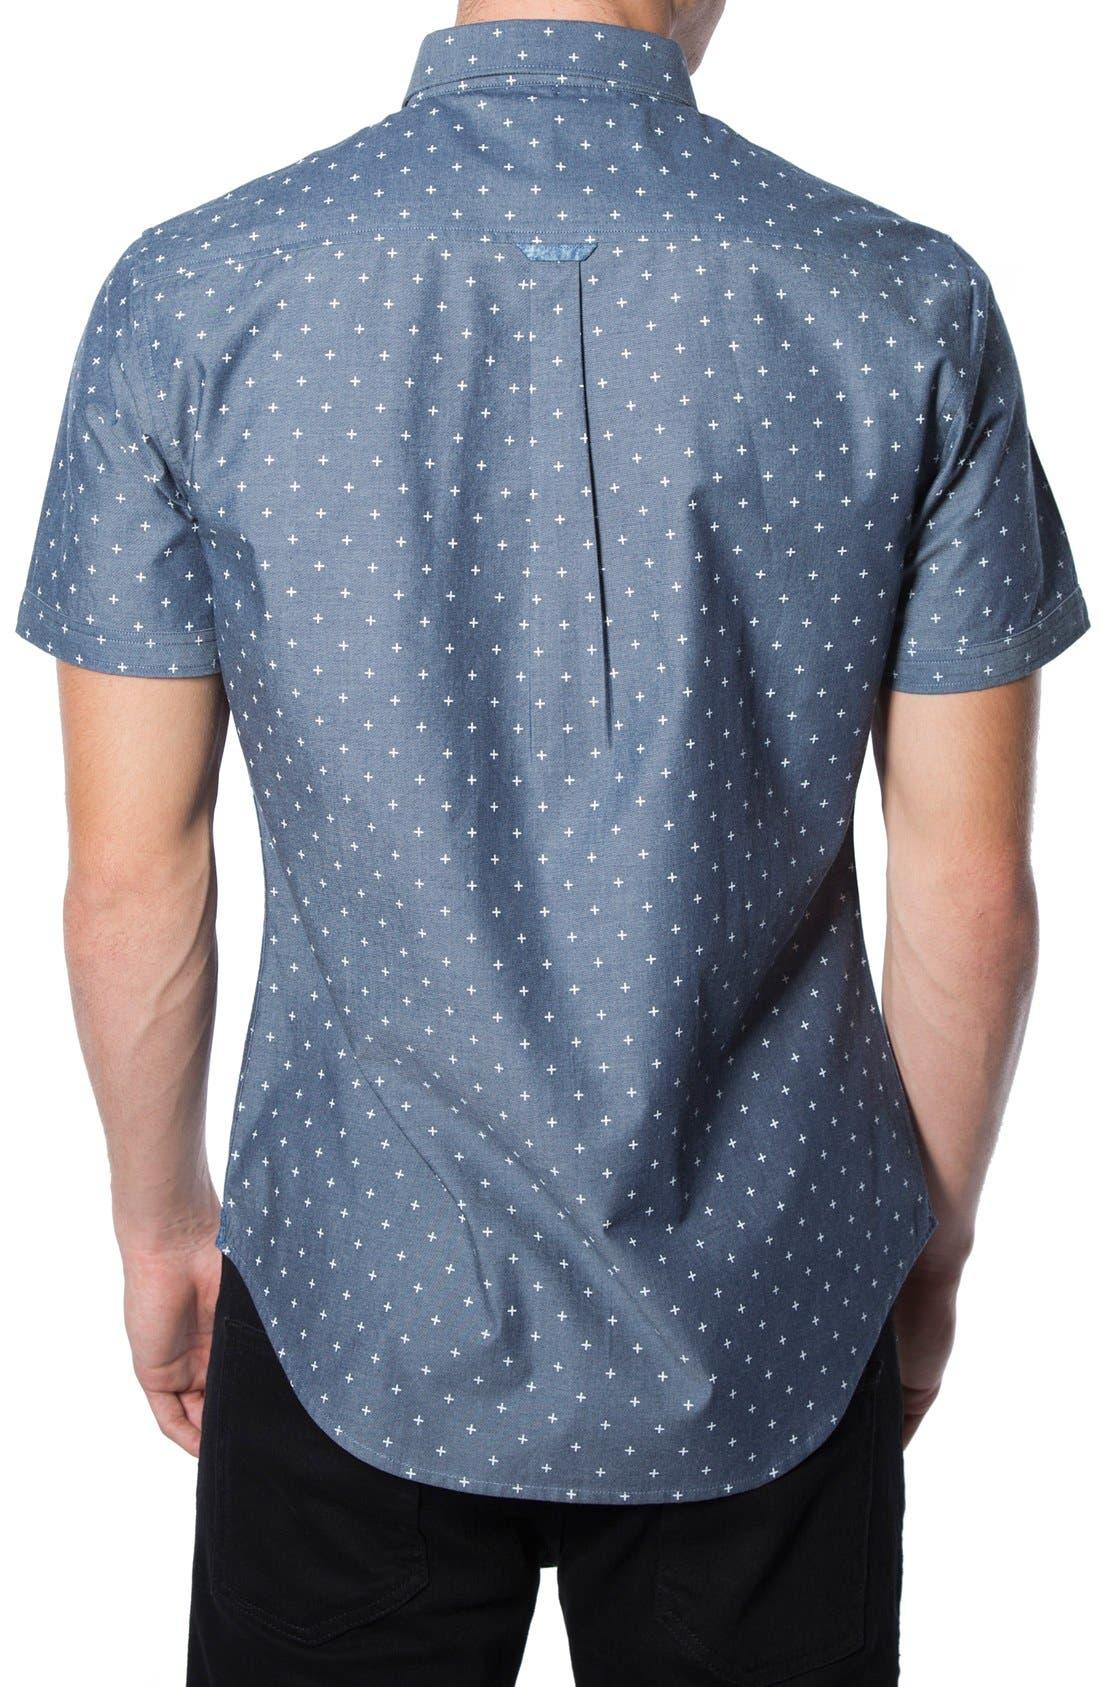 'Habits' Trim Fit Short Sleeve Chambray Shirt,                             Alternate thumbnail 2, color,                             410